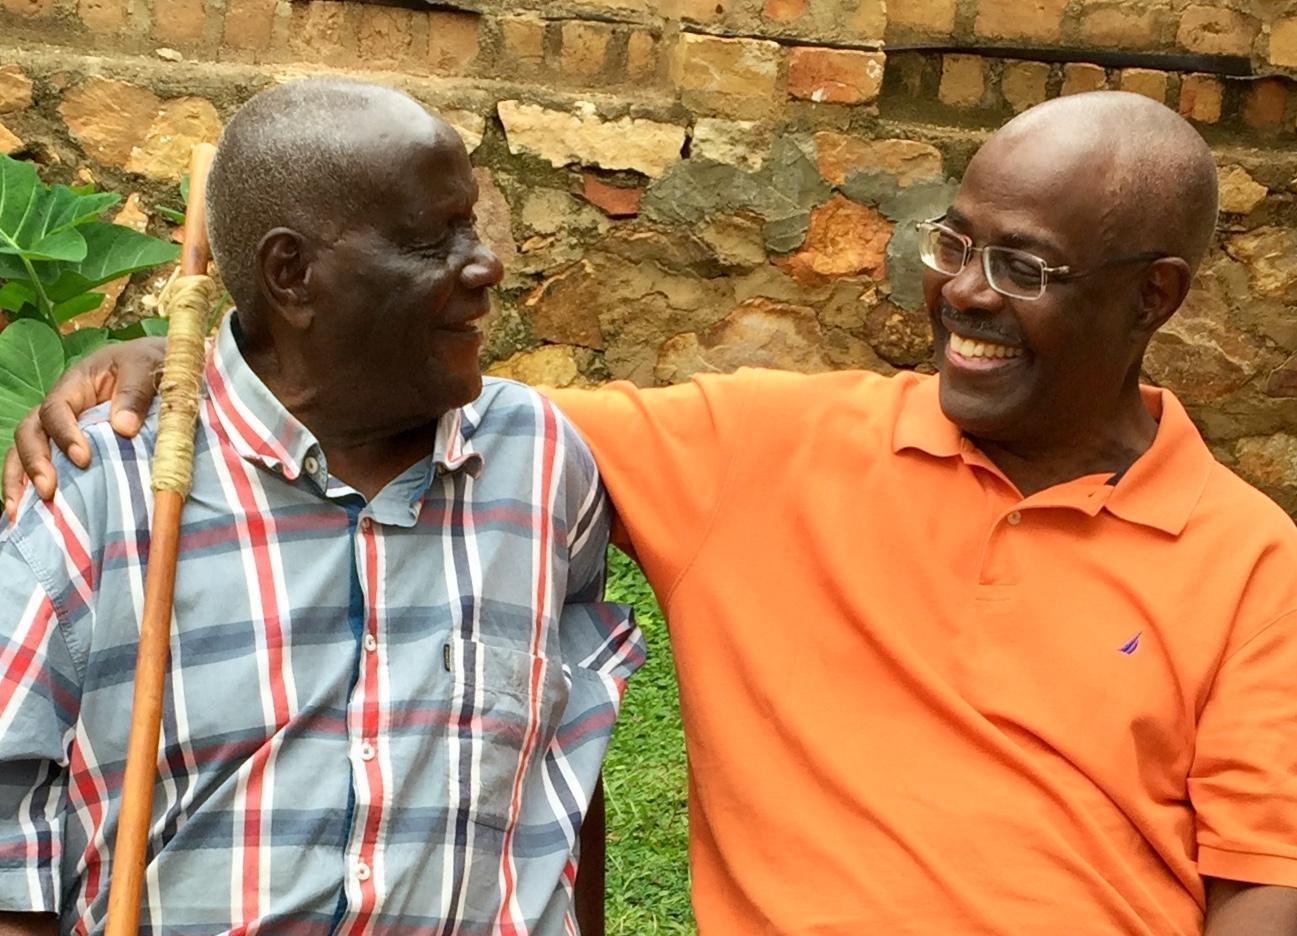 Grateful to Uganda's Great Generation